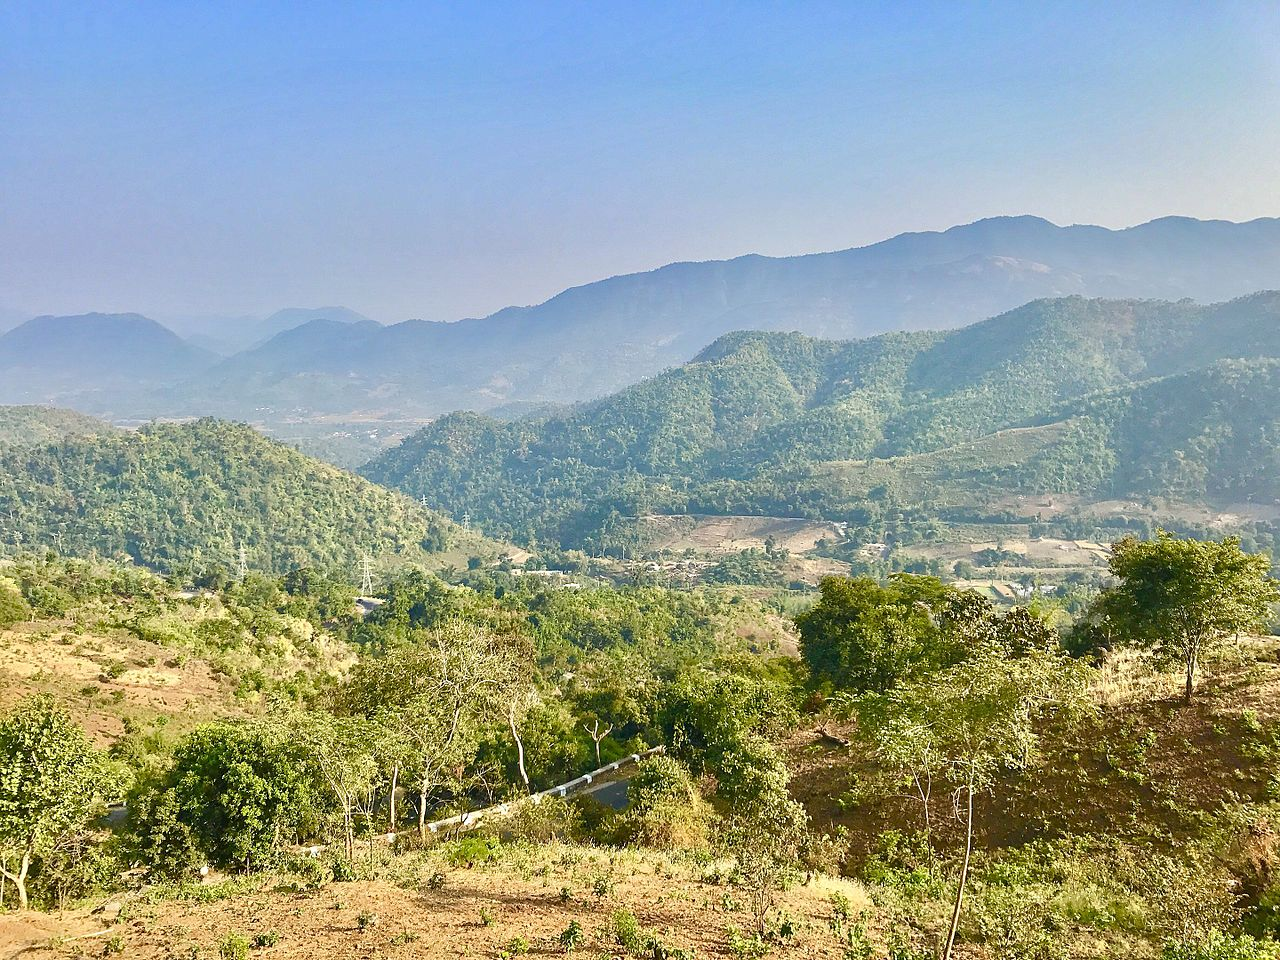 Place To Visit In and Around Araku Valley-Ananthagiri Hills